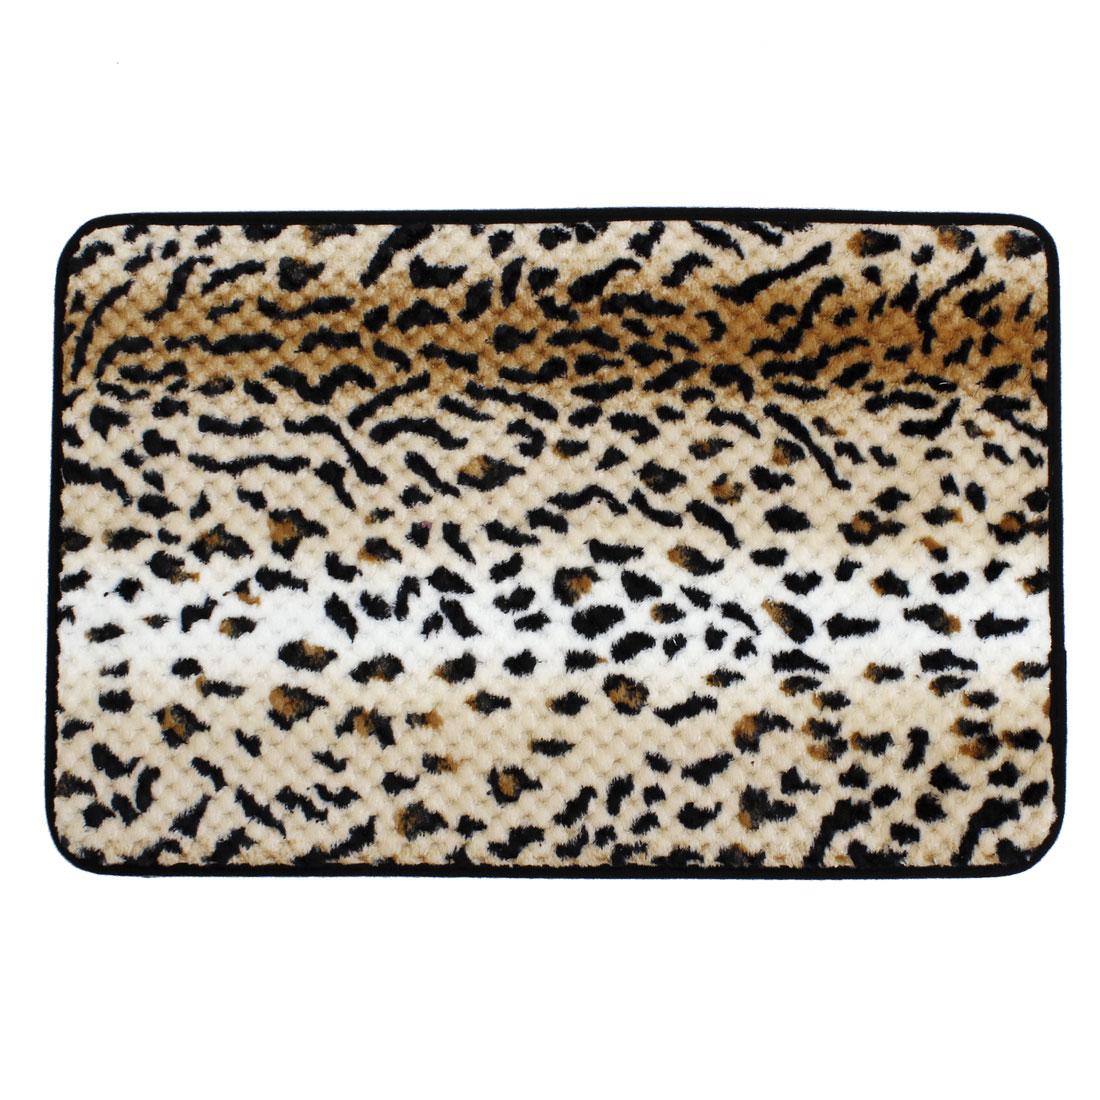 60cm x 40cm Black Brown Leopard Print Antislip Floor Mat Area Rug Carpet